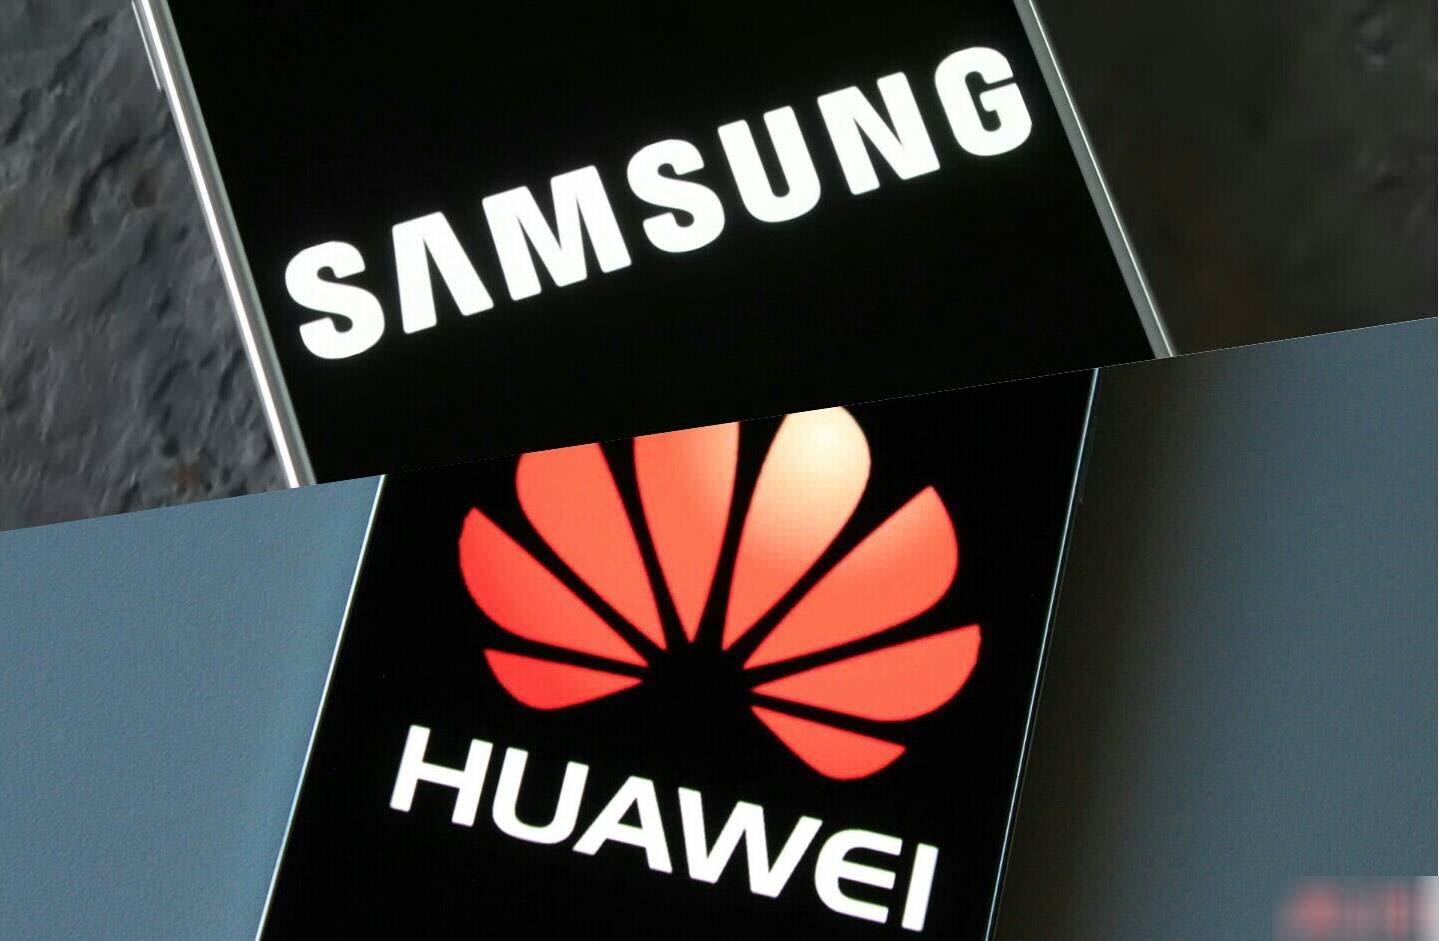 samsung-vuot-huawei-thanh-nha-san-xuat-smartphone-so-1-the-gioi.jpg